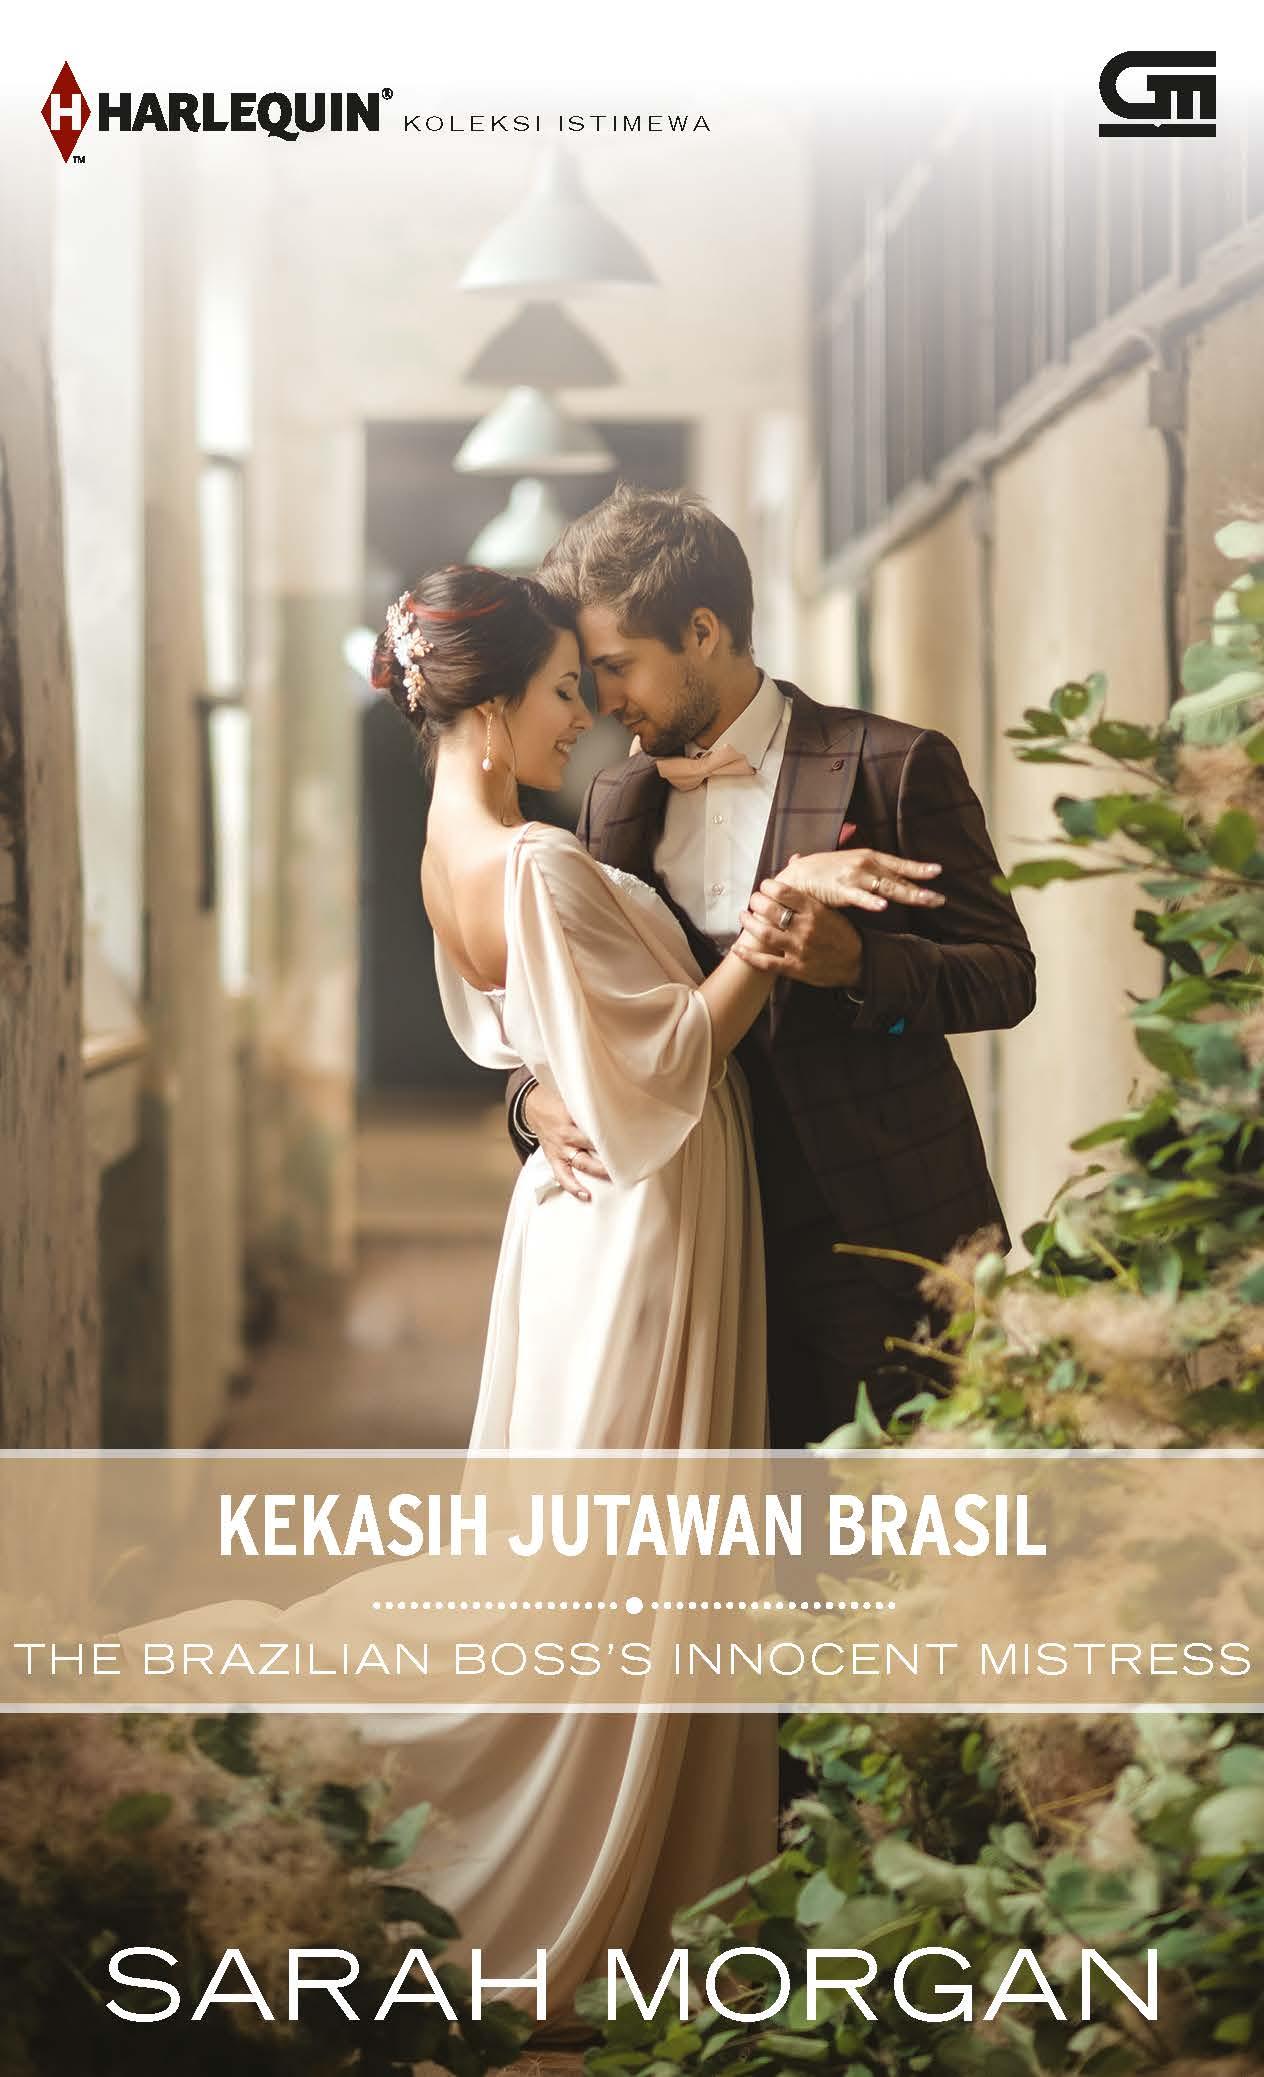 Harlequin Koleksi istimewa: Kekasih Jutawan Brasil (The Brazilian Boss\'s Innocent Mistress)